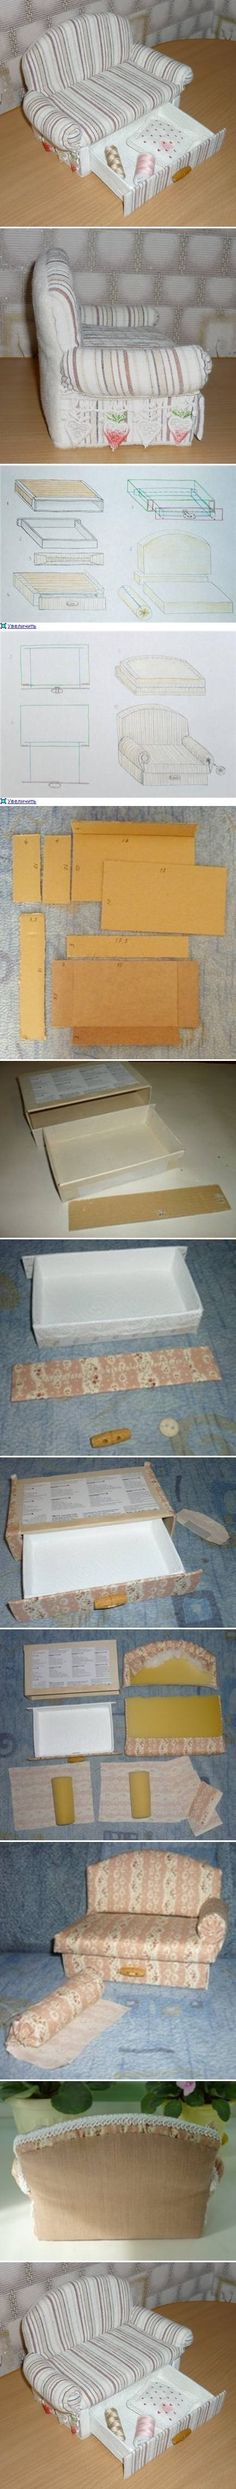 Cardboard sofa with drawer